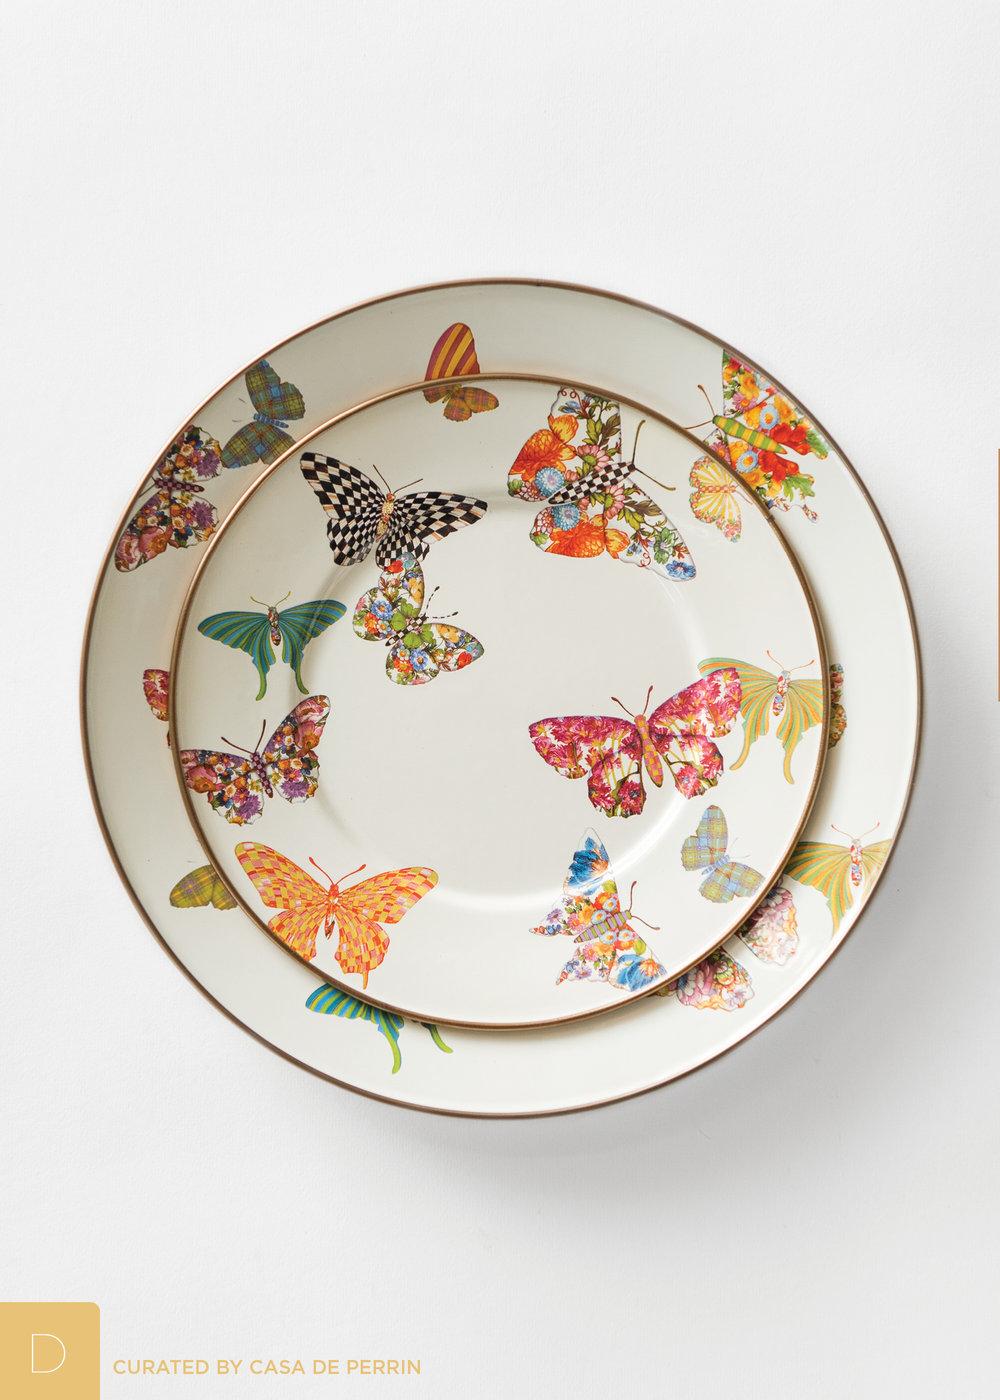 Mackenzie-childs | Butterfly Garden & Mackenzie-childs | Butterfly Garden \u2014 Casa de Perrin